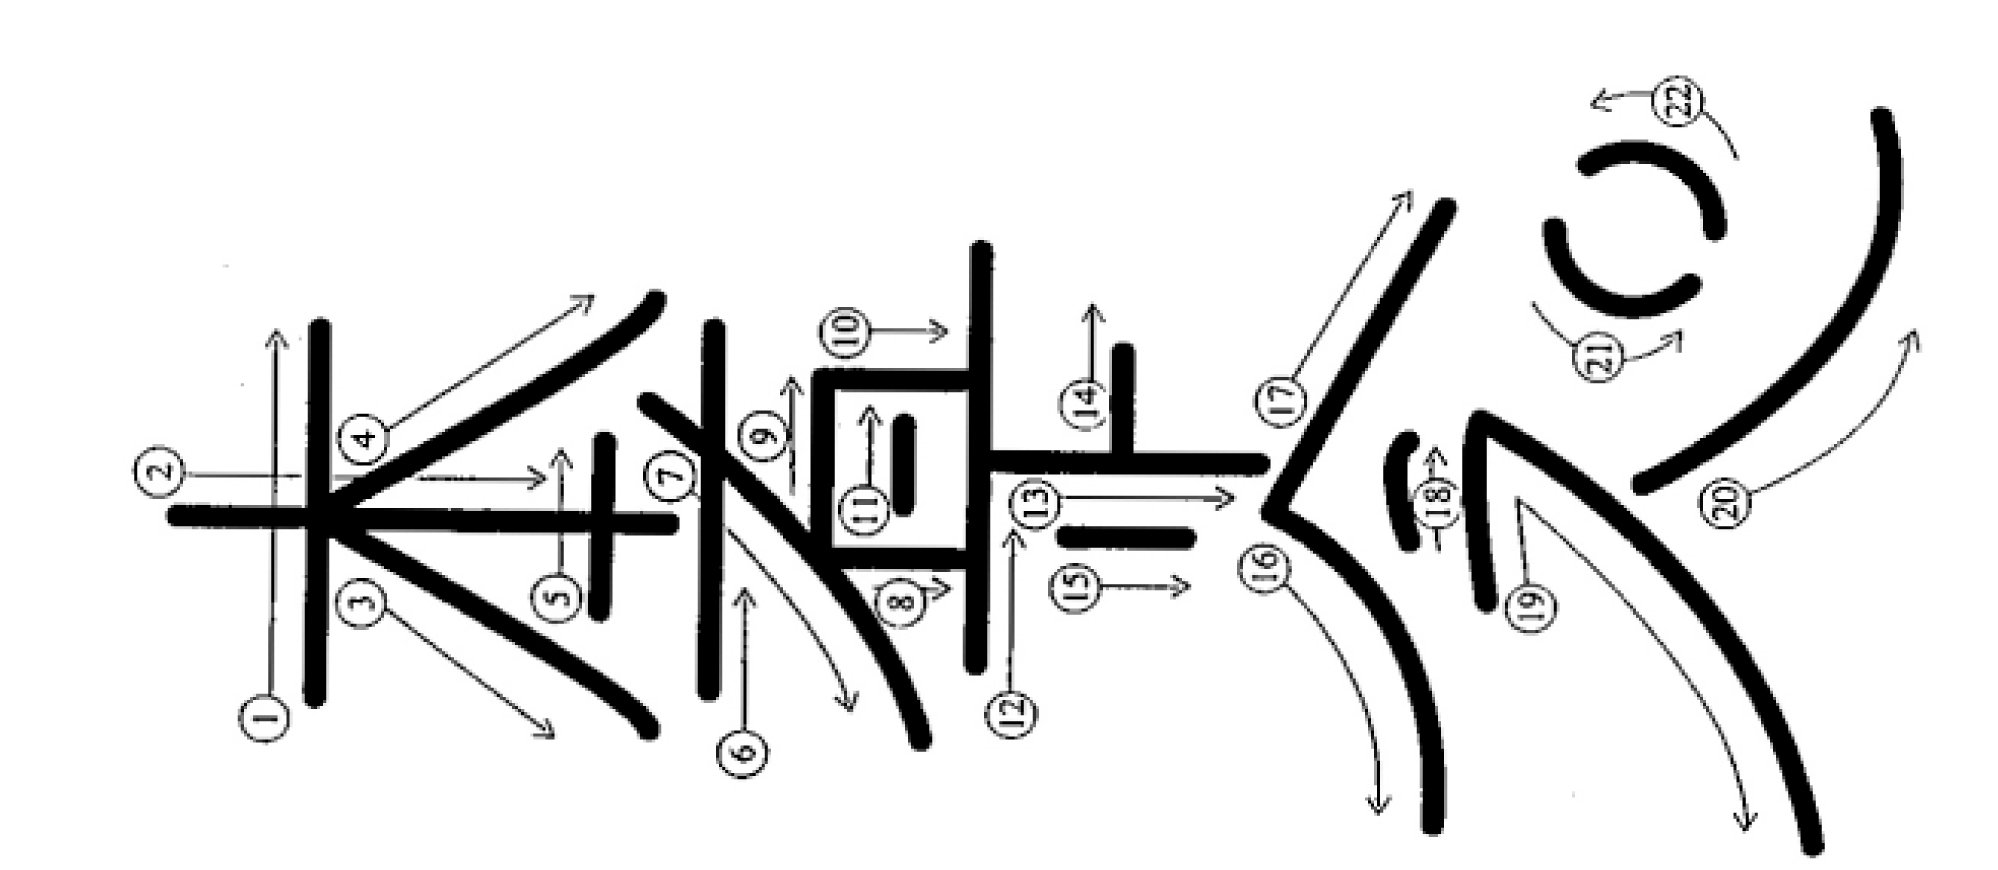 Reiki Symbols Cards Reiki Learning Series Corinne Friesen